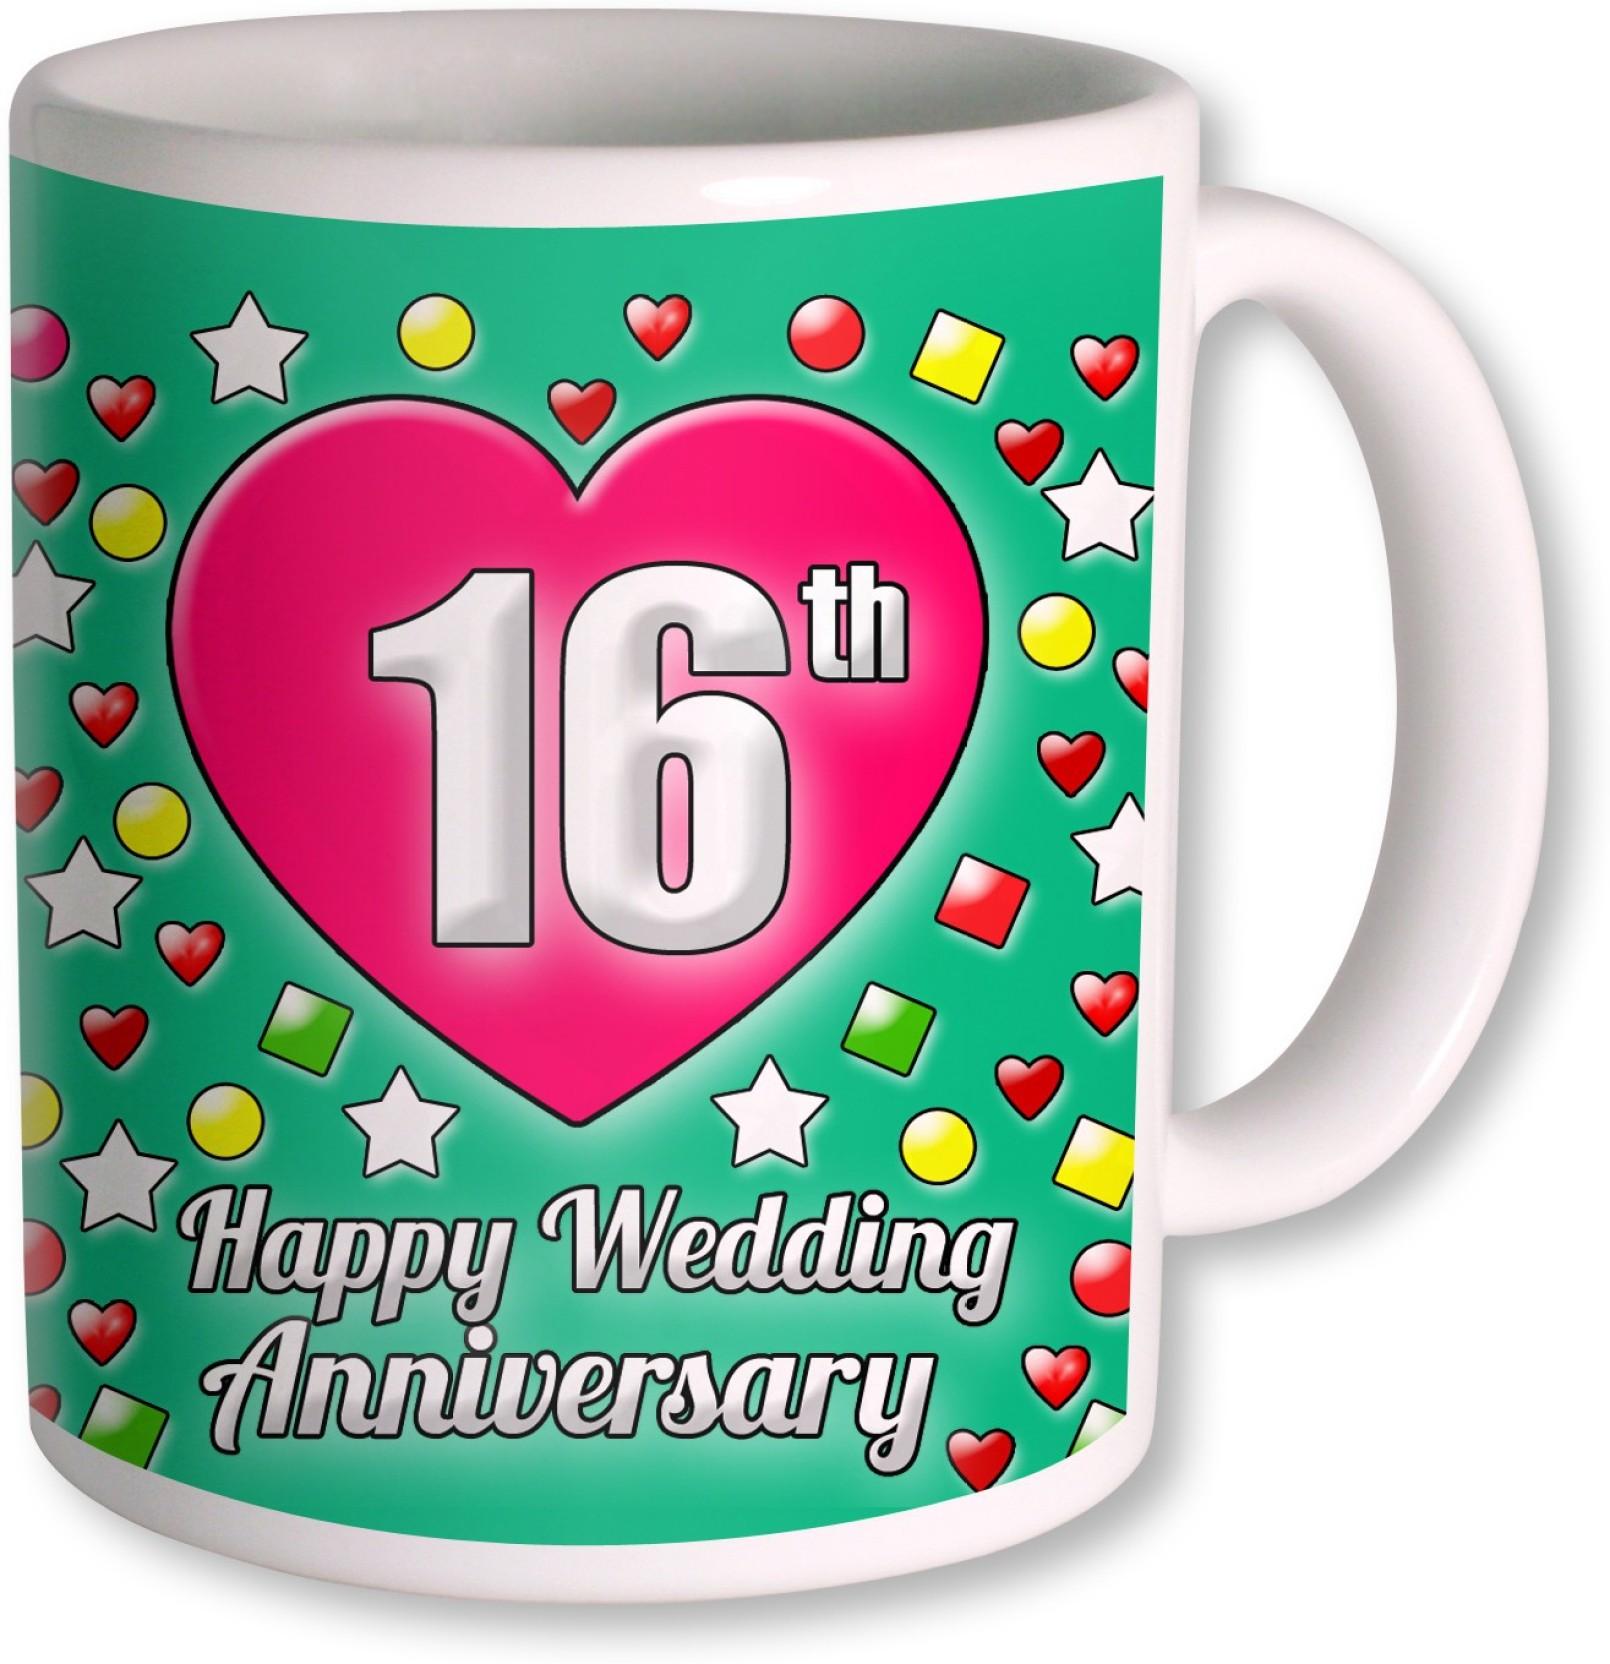 16th Wedding Anniversary.Photogiftsindia Gifts For 16th Wedding Anniversary Coffee Ceramic